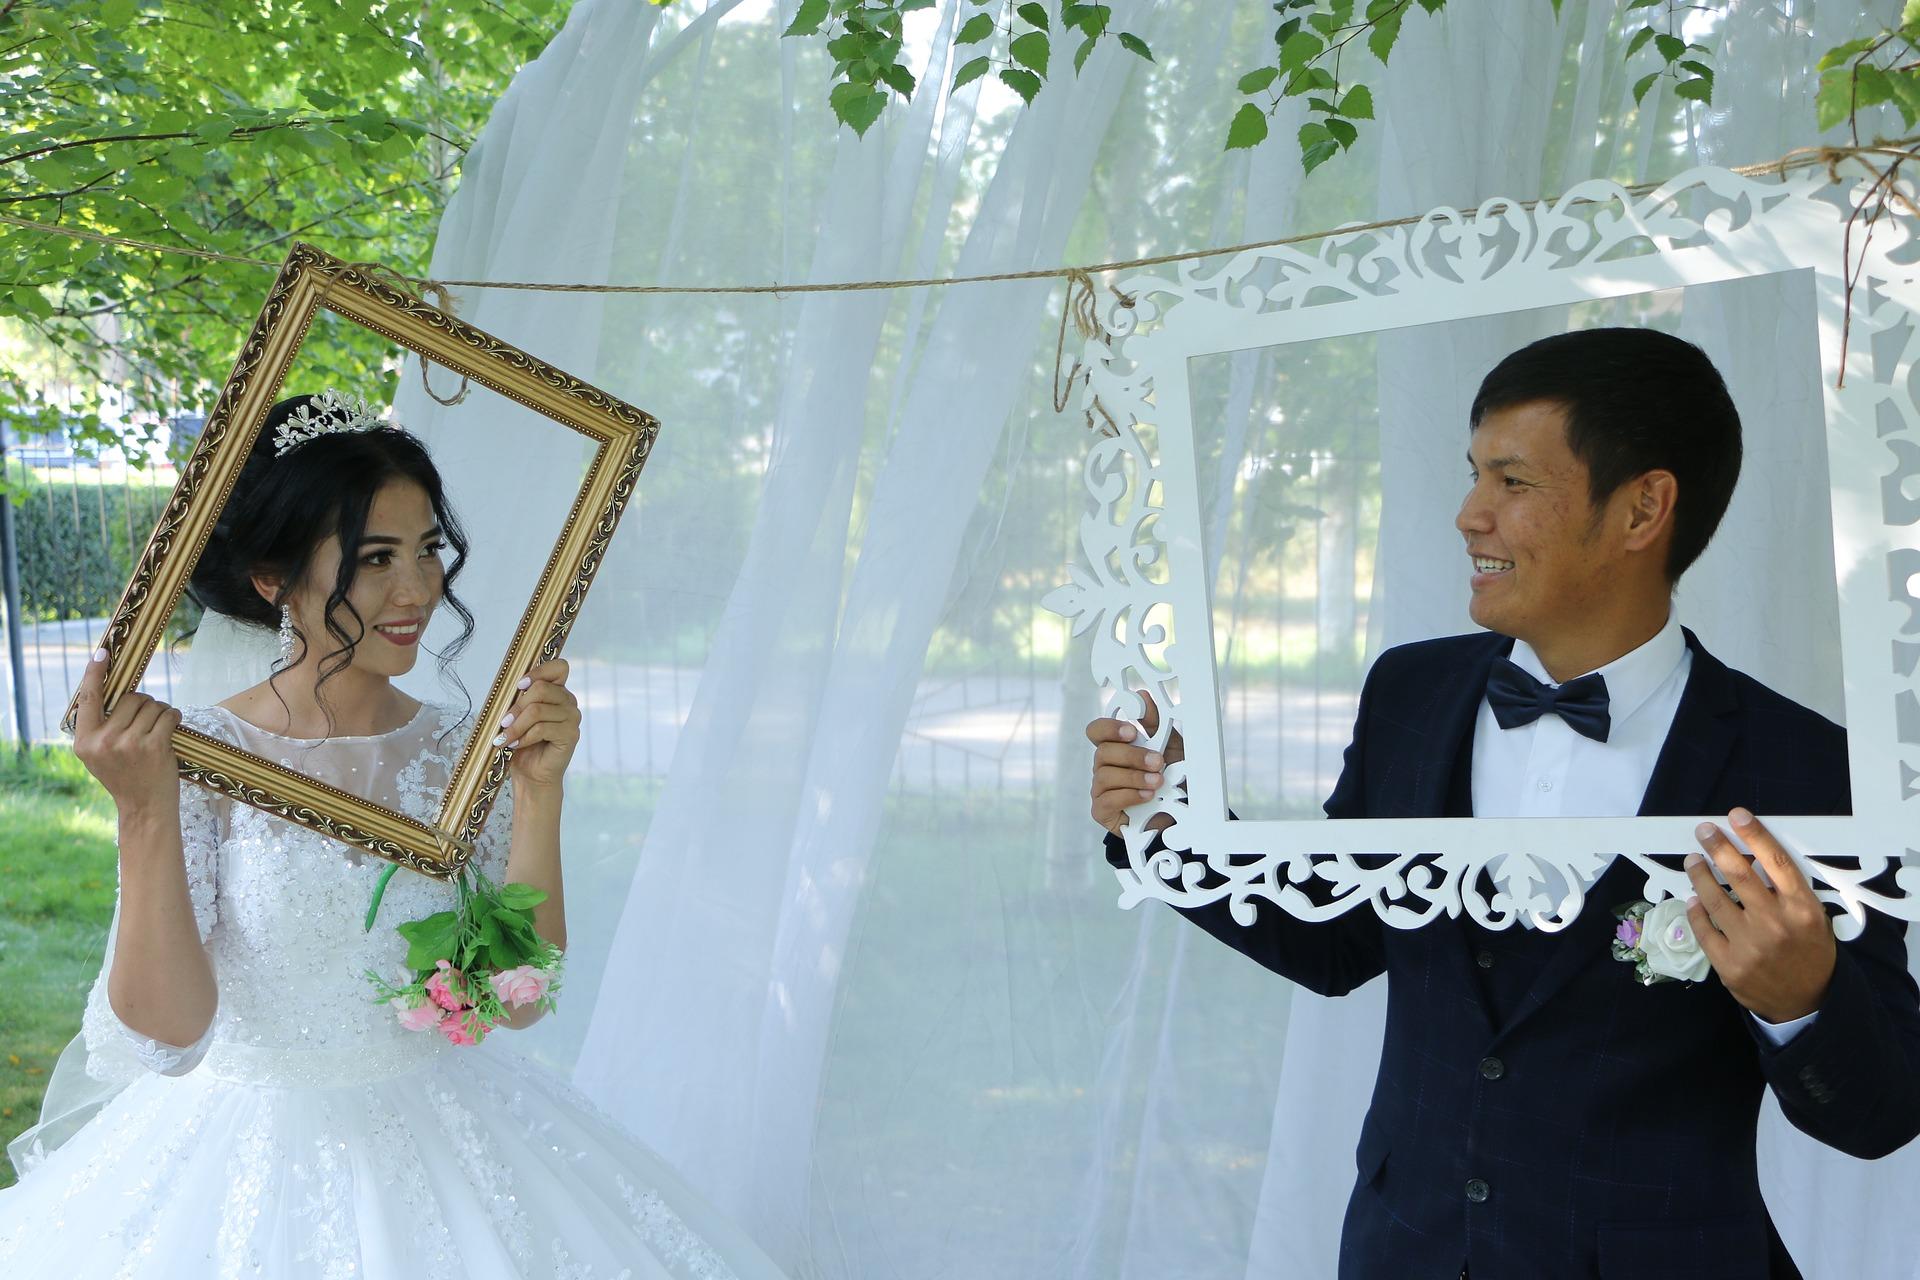 wedding-3532742_1920